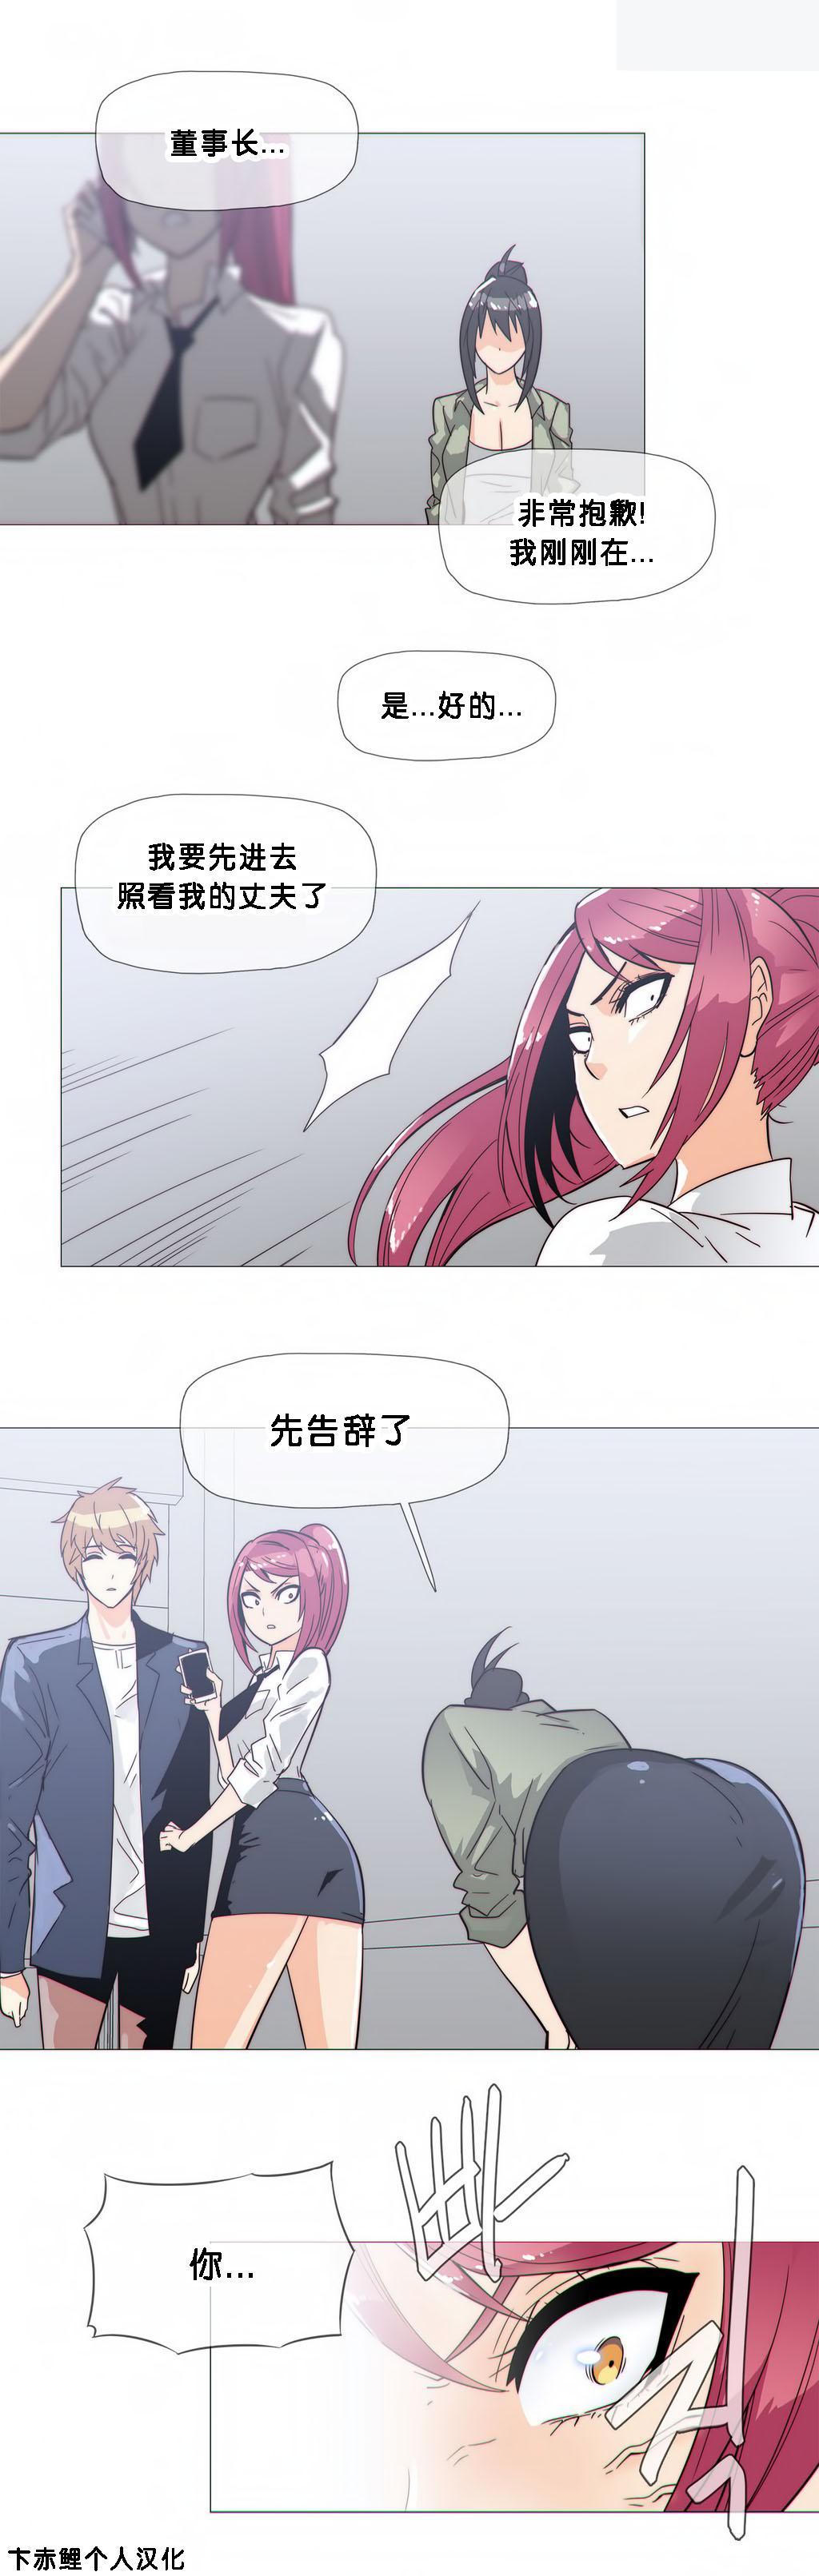 HouseHold Affairs 【卞赤鲤个人汉化】1~21话(持续更新中) 458